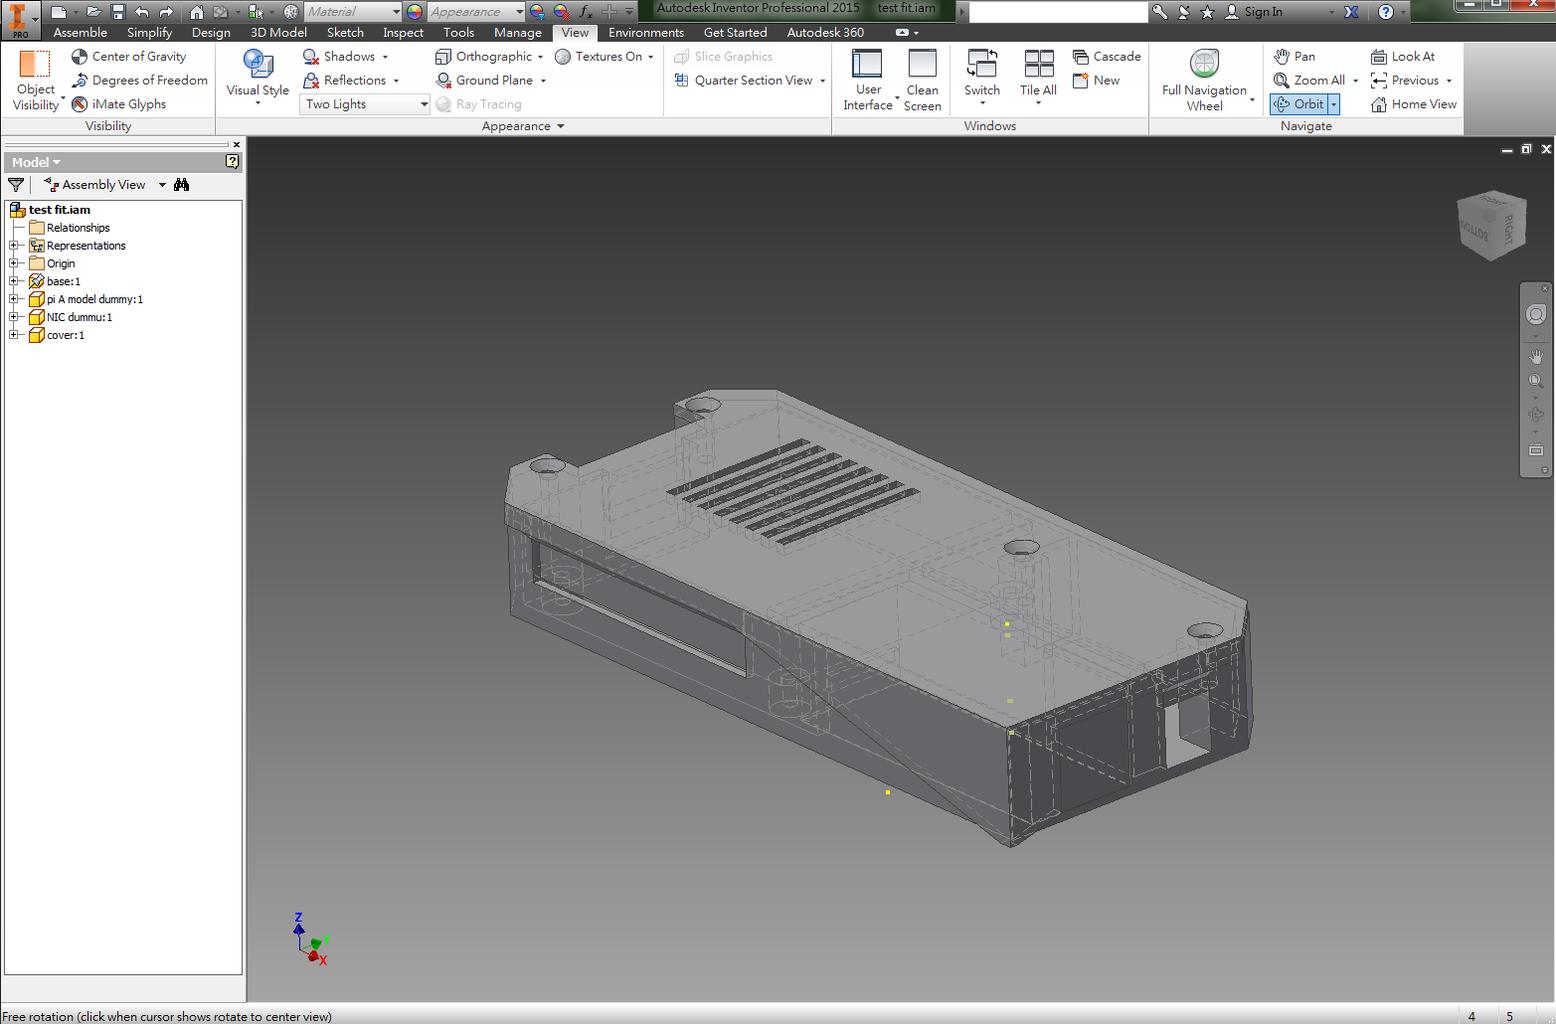 3D Printing Case (Advance)